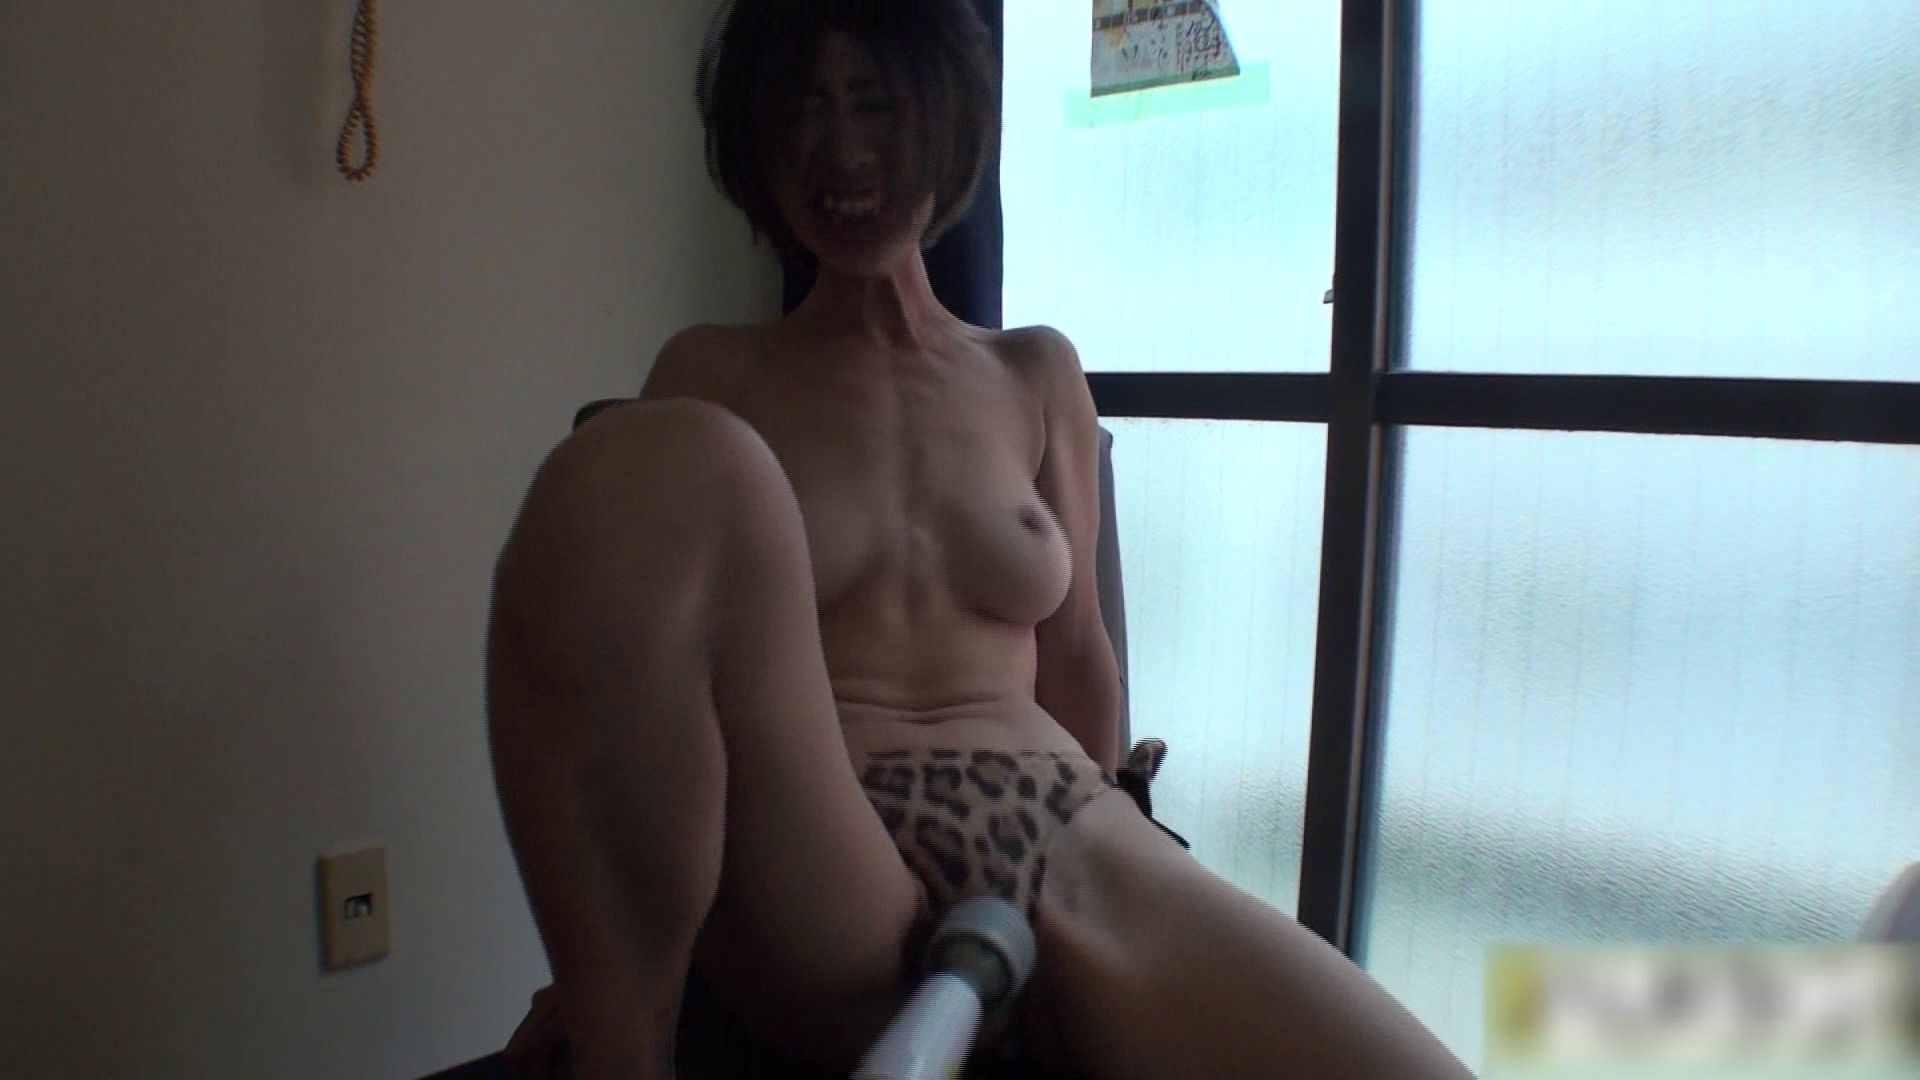 S級厳選美女ビッチガールVol.46 ギャルのエロ動画 オマンコ動画キャプチャ 60画像 23